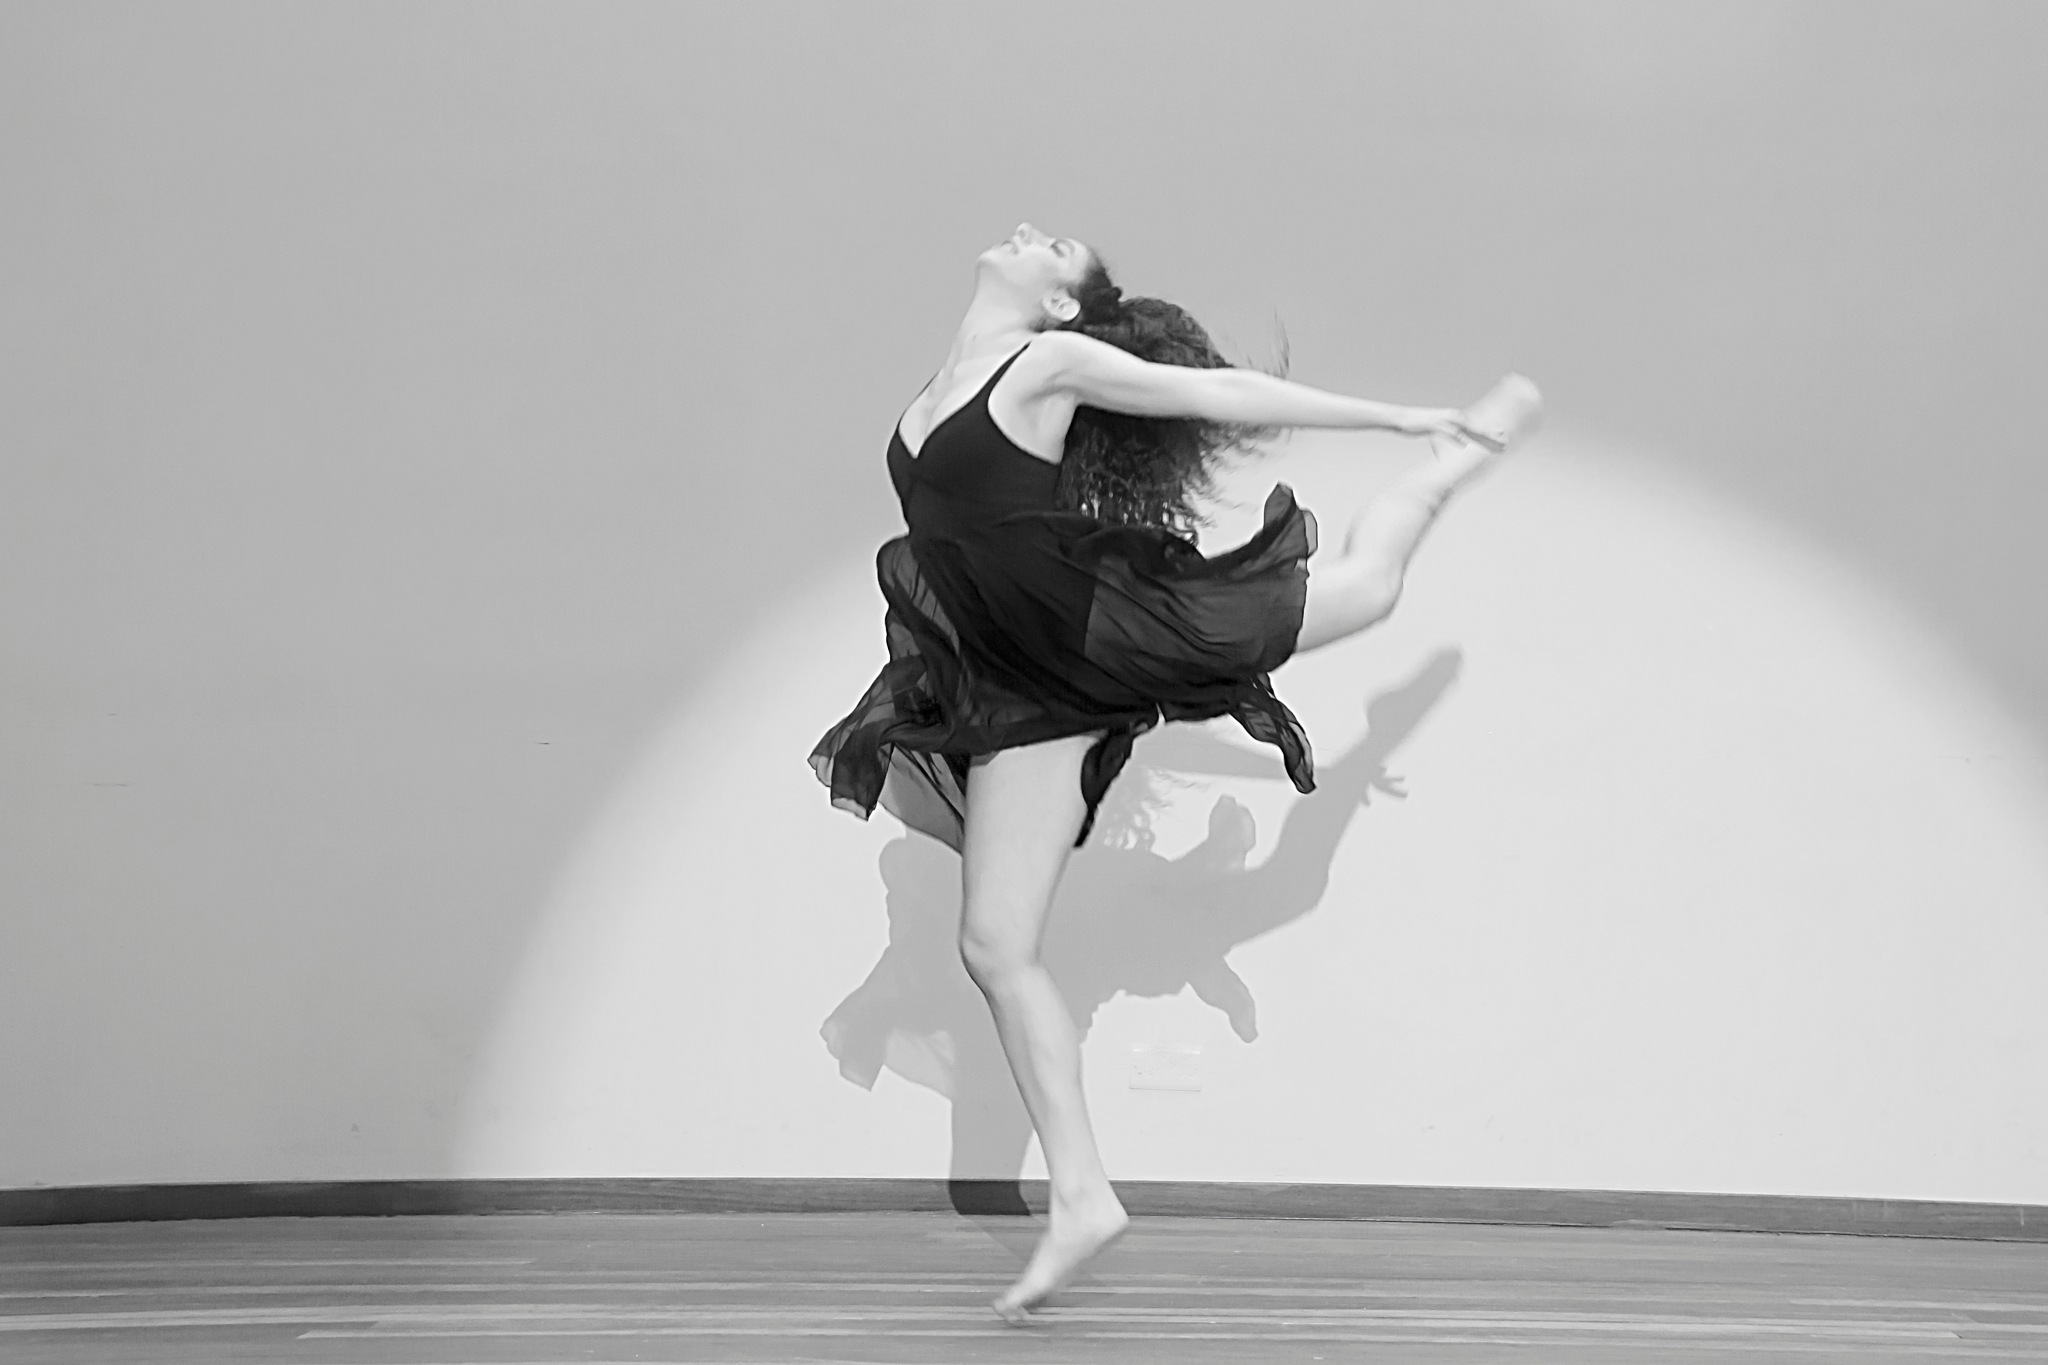 Dancing by Koula Komodromou Hadjichrysanthou